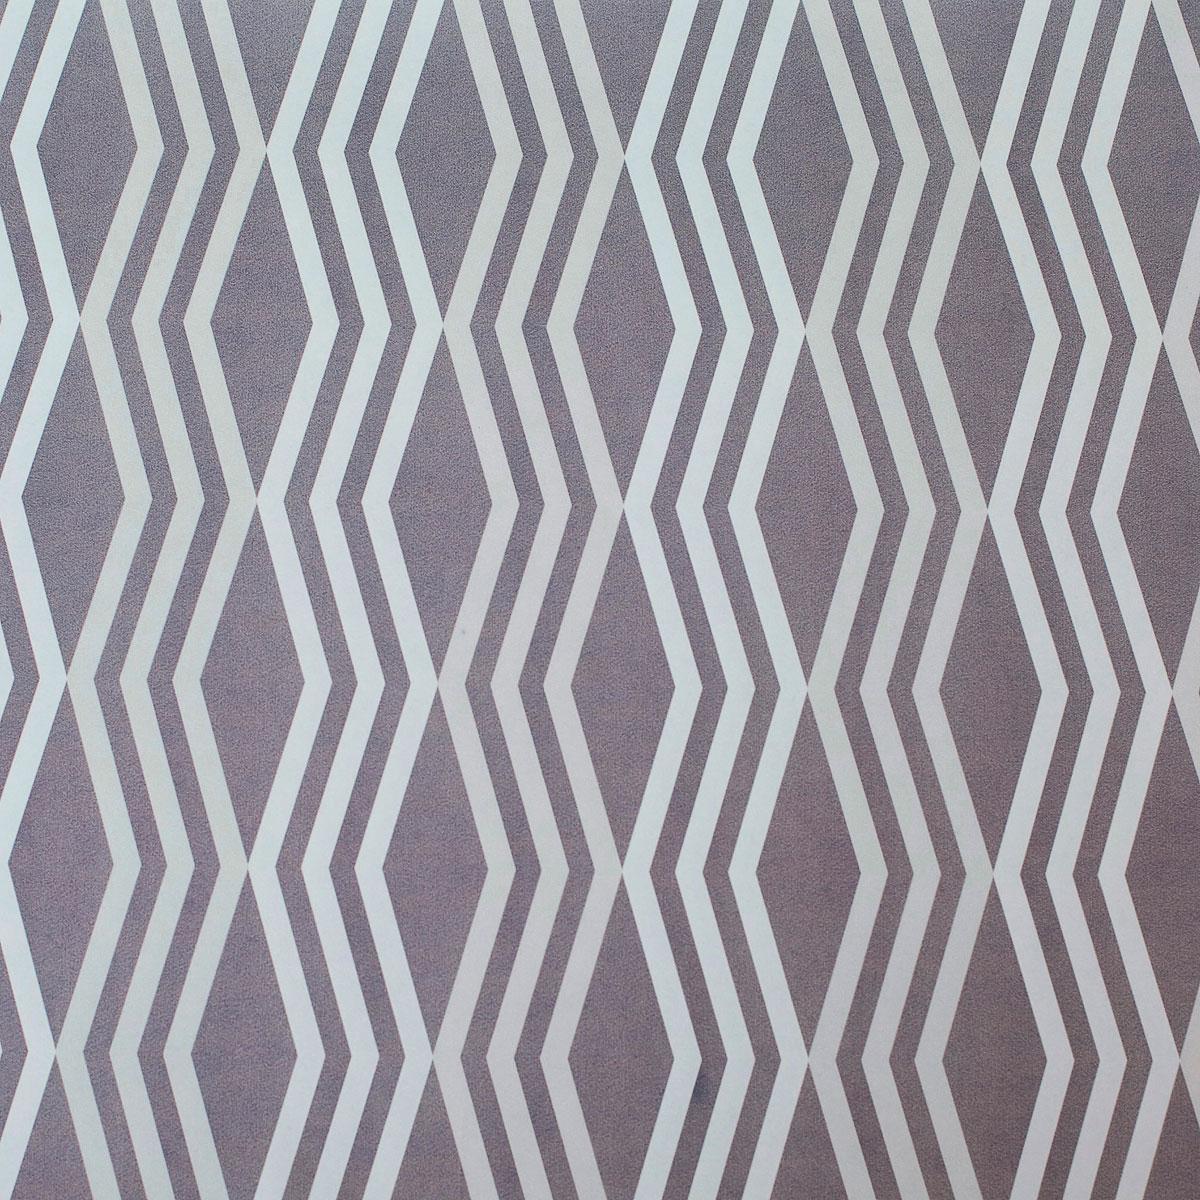 Оберточная бумага для цветов Орнамент